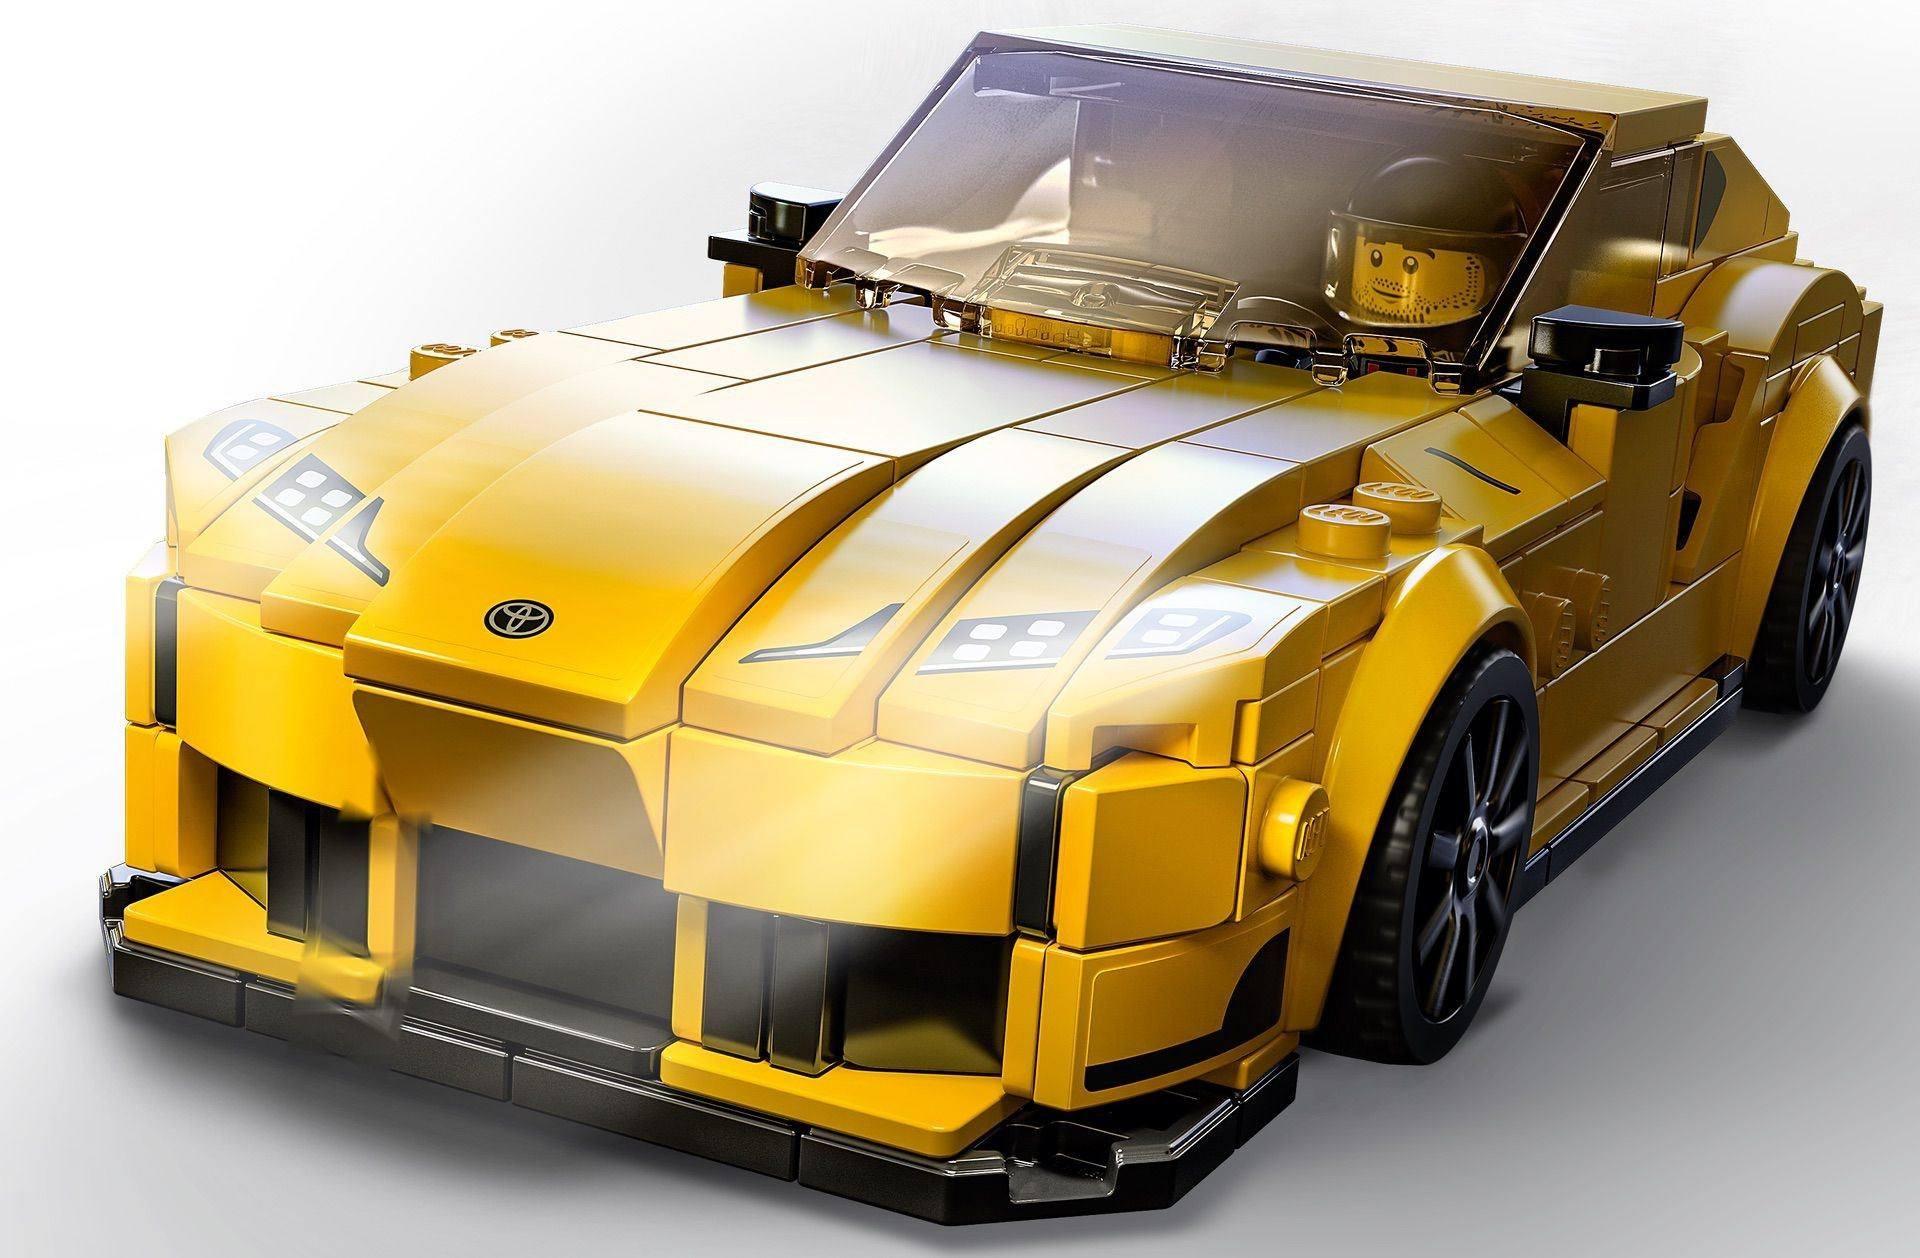 Toyota_GR_Supra_lego-0006